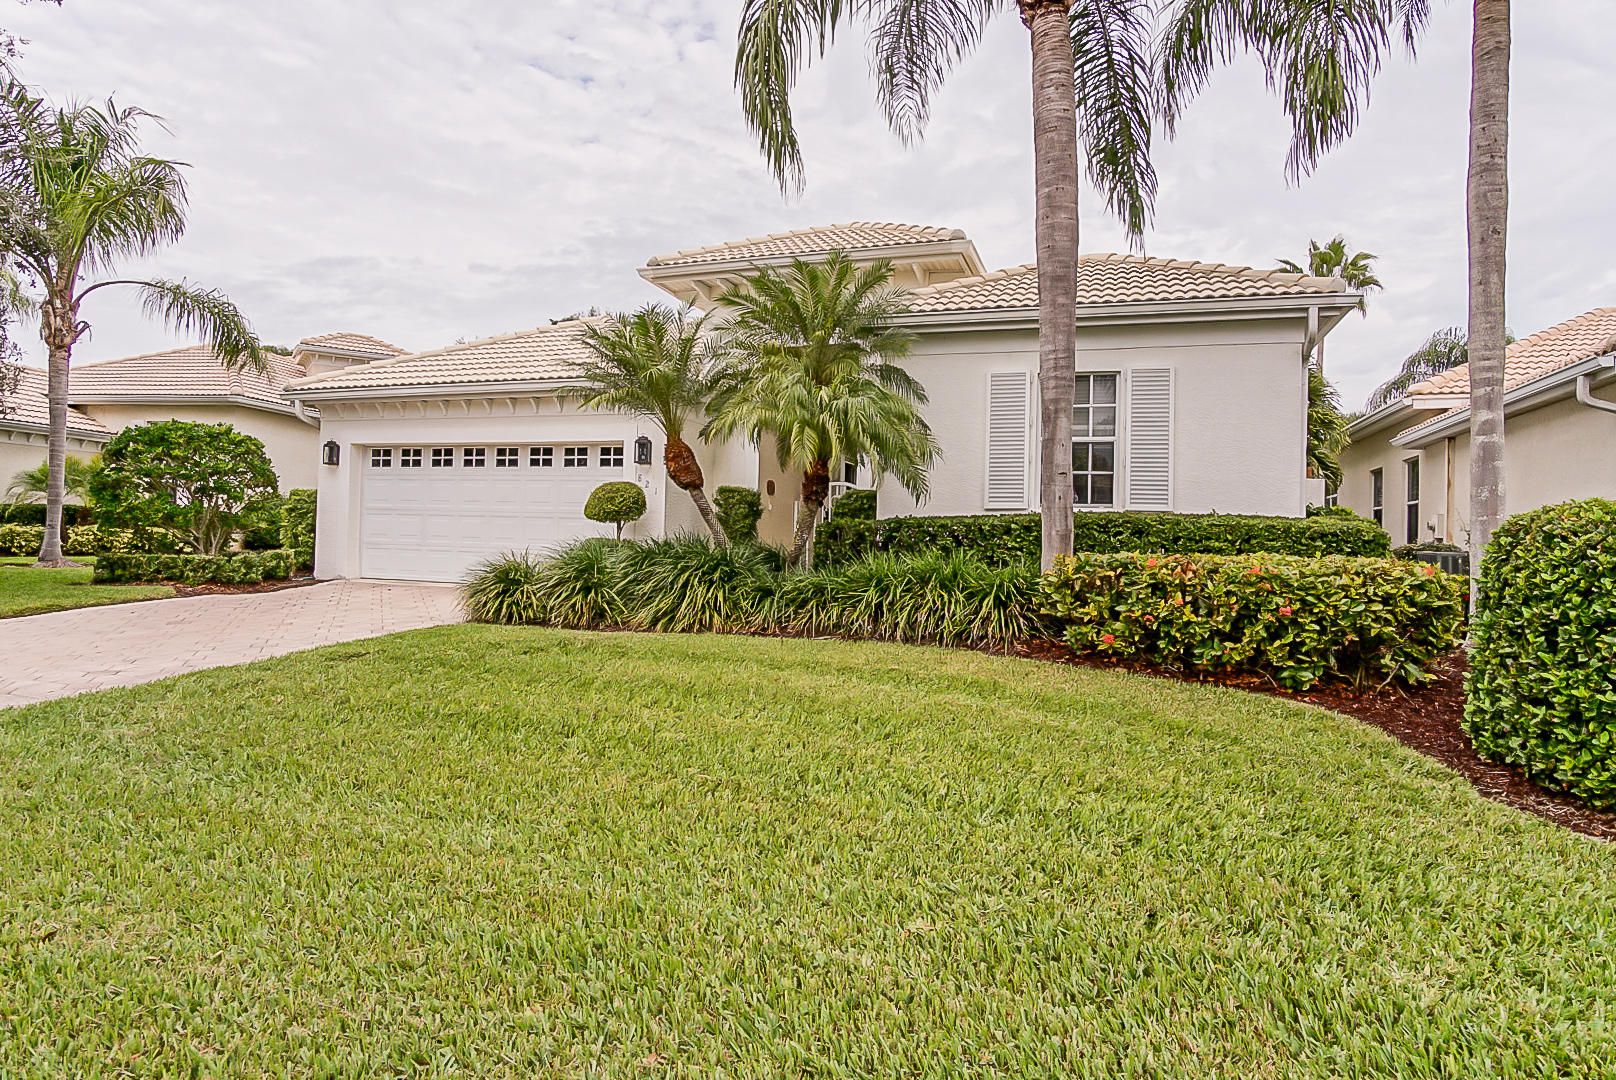 821 Island Club Square - Vero Beach, Florida